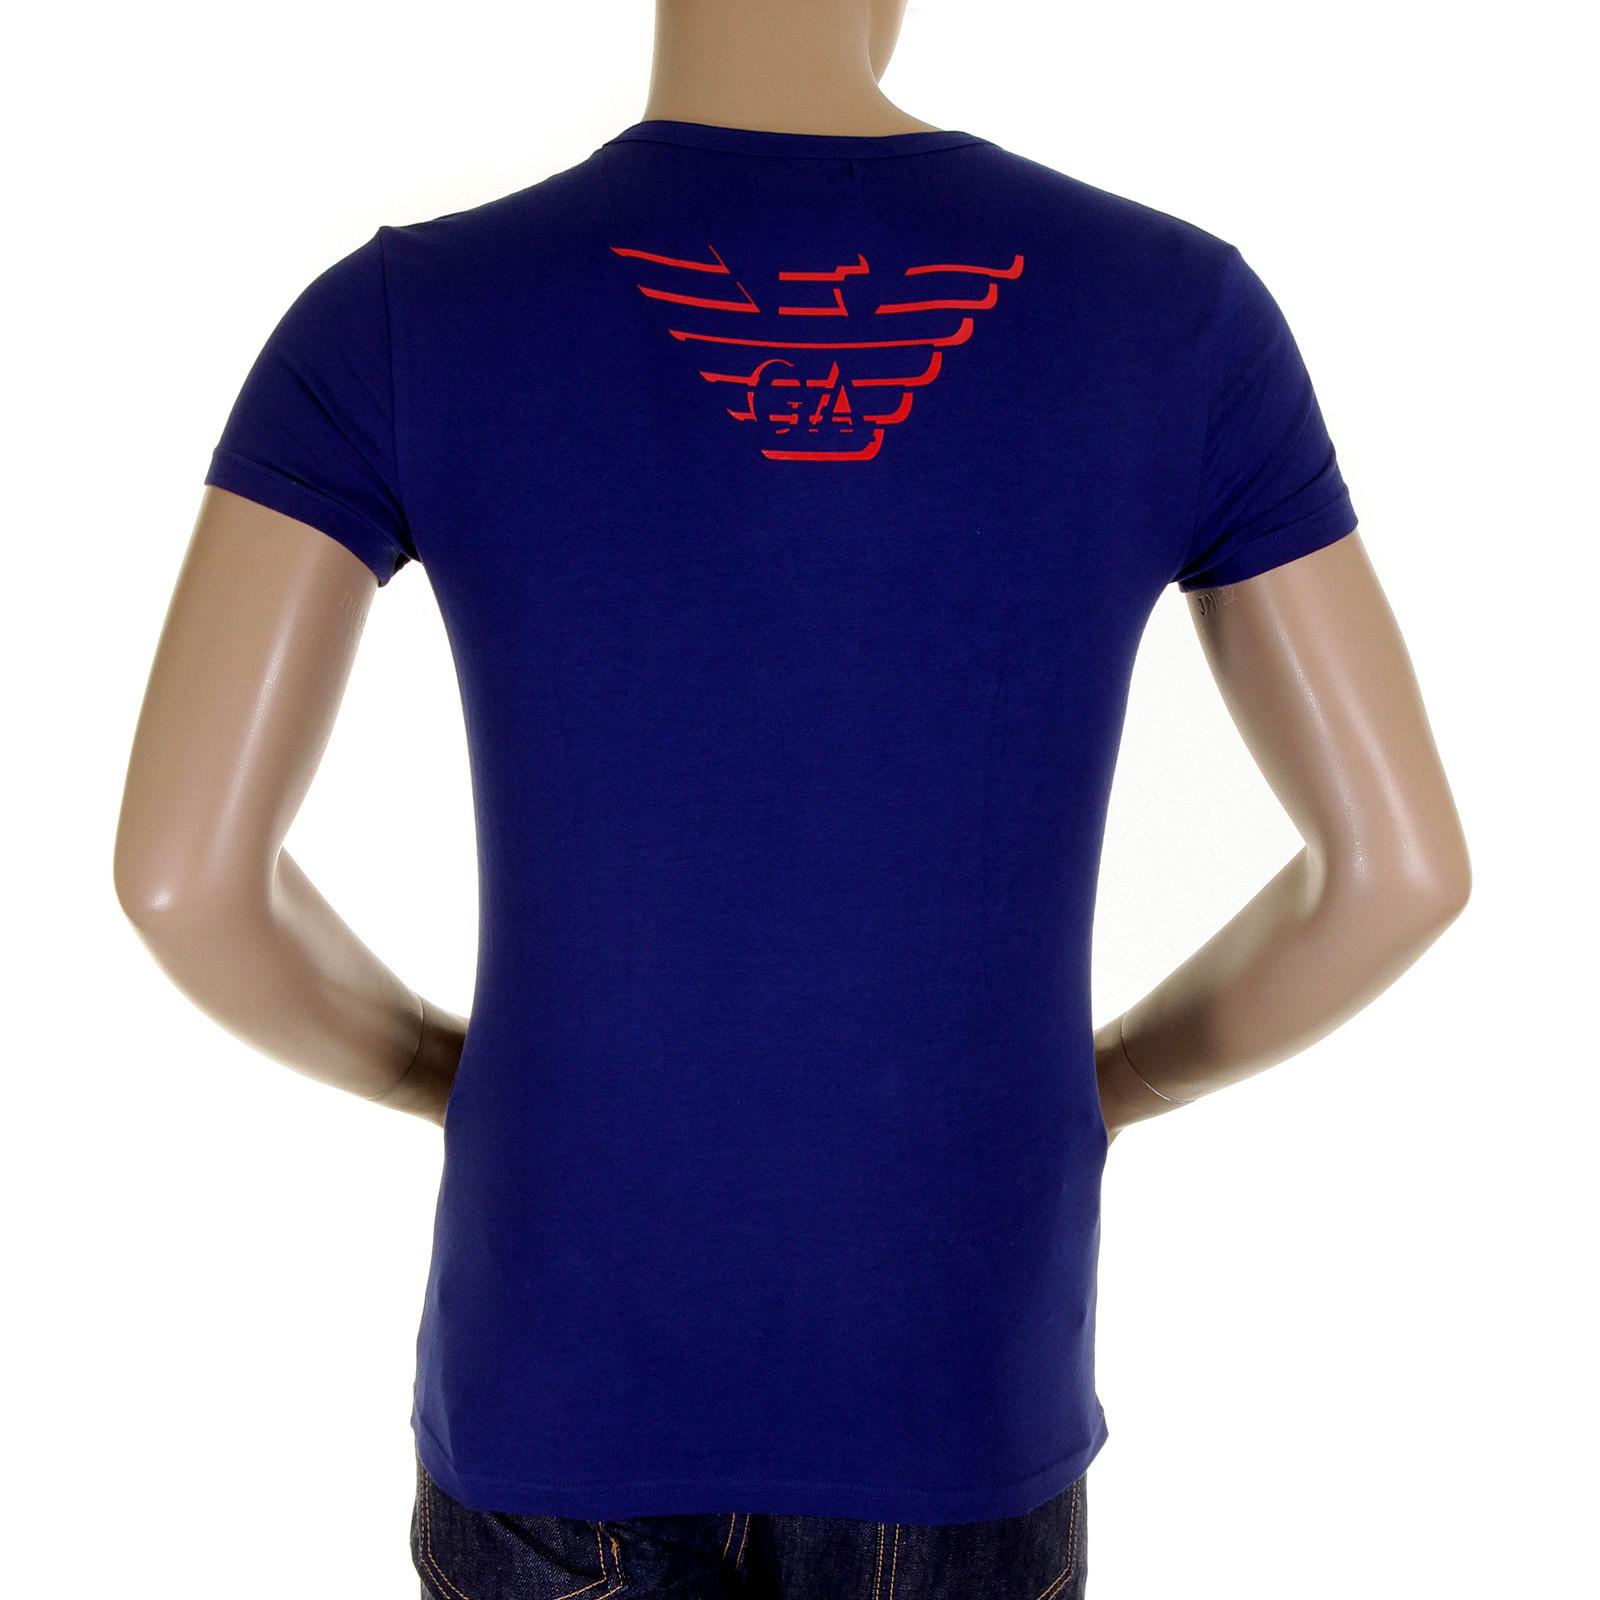 99dbb2b30331c Emporio Armani t shirt china blue v neck t shirt 110752 1S512 EAM1506 at Togged  Clothing